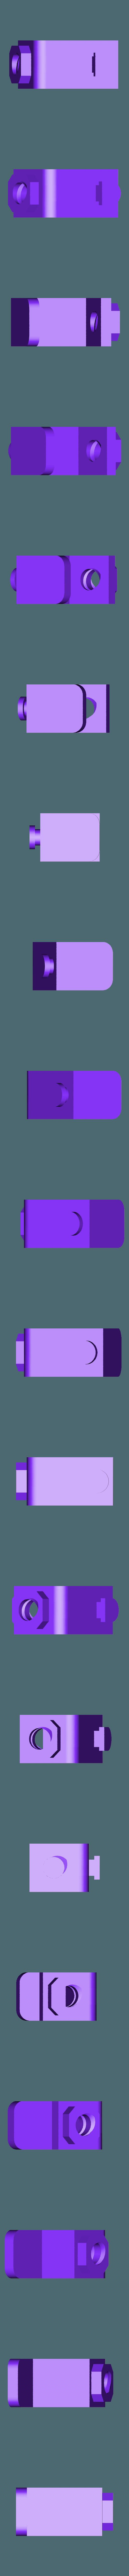 Tools_Tray_iguigui_1.stl Download free STL file Tools tray • Design to 3D print, iguigui